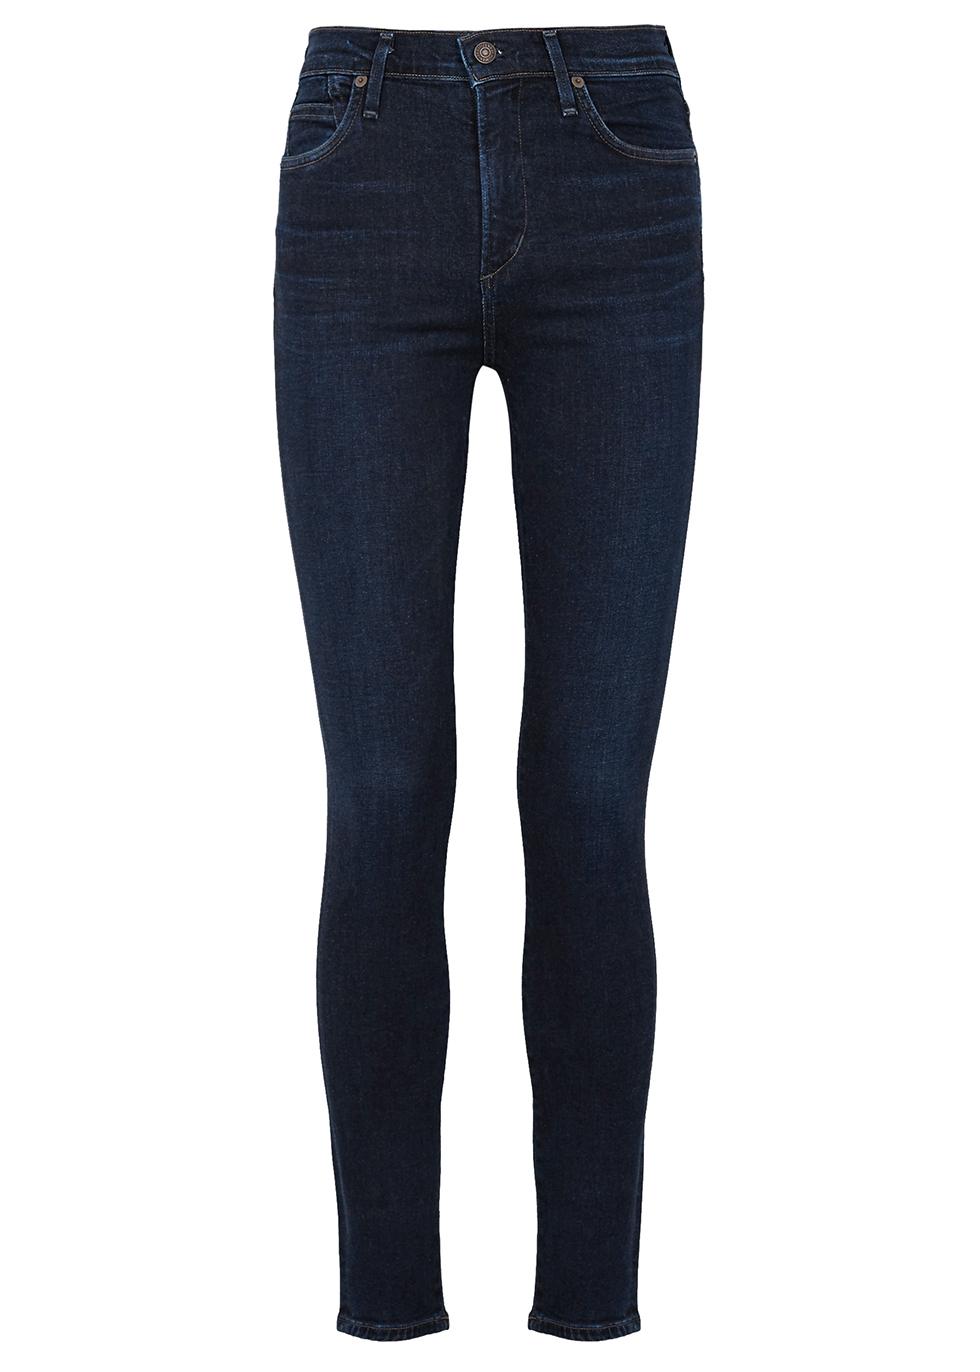 Rocket indigo skinny jeans